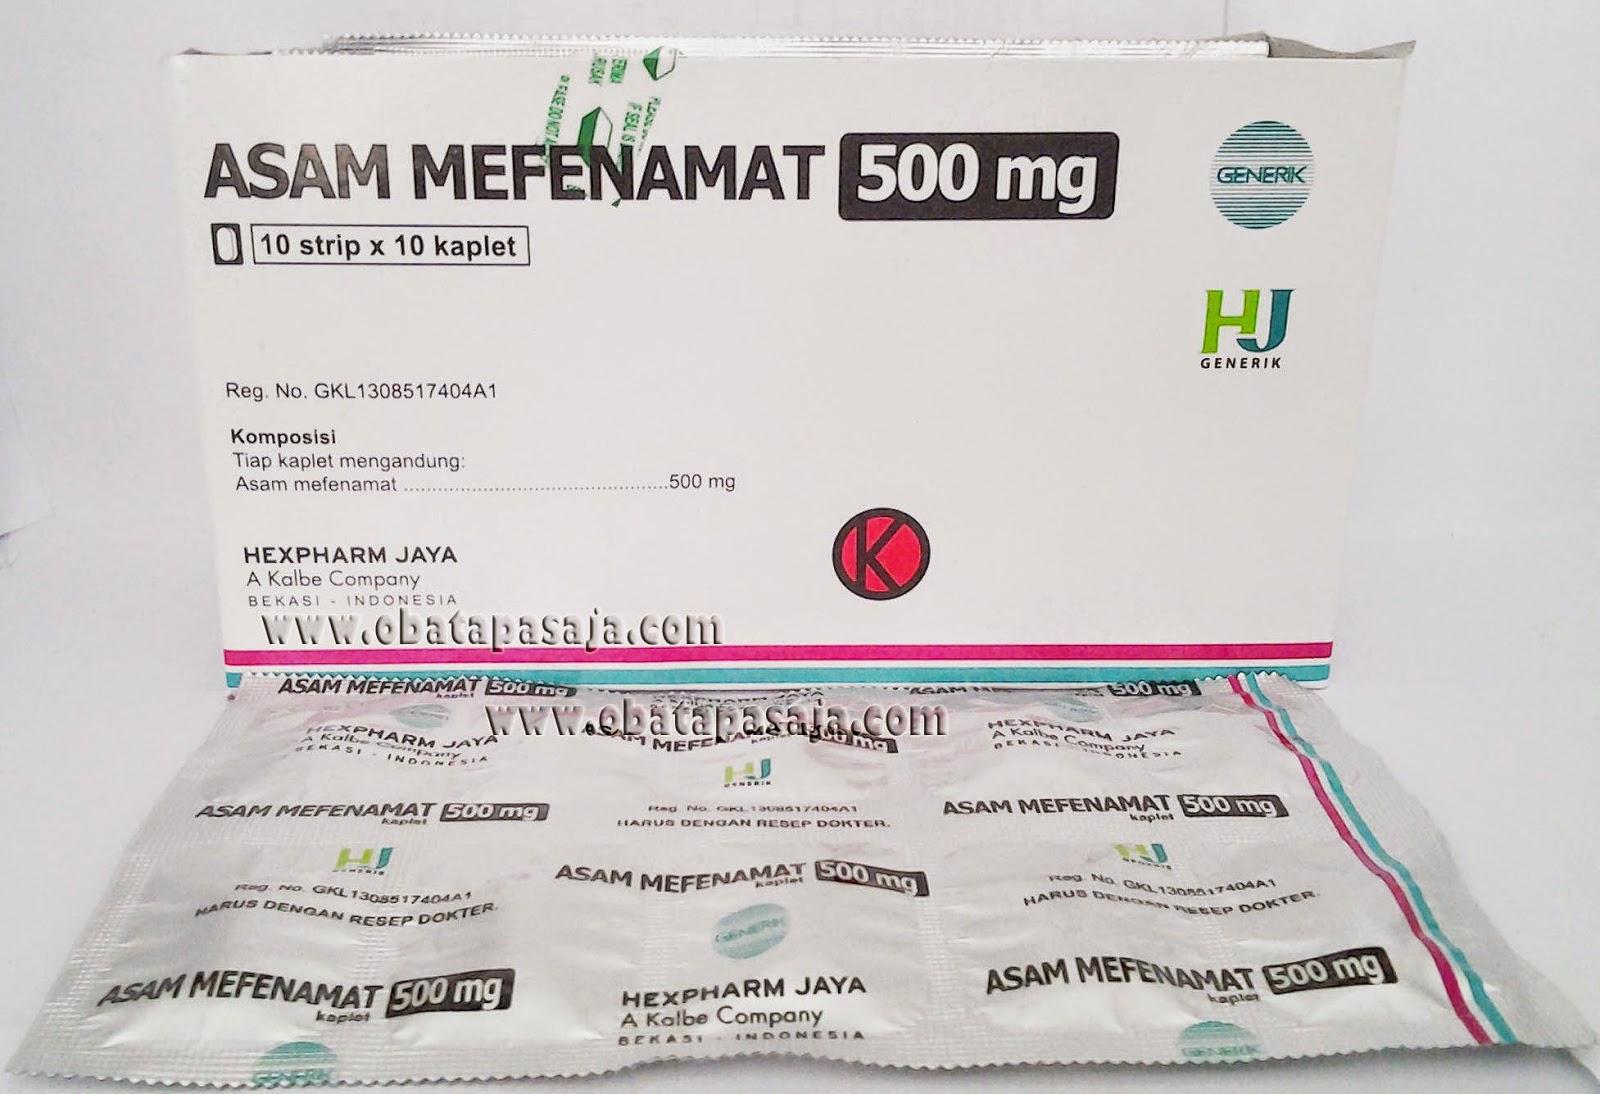 Asam Mefenamat analgesik untuk meringankan sakit gigi, sakit kepala